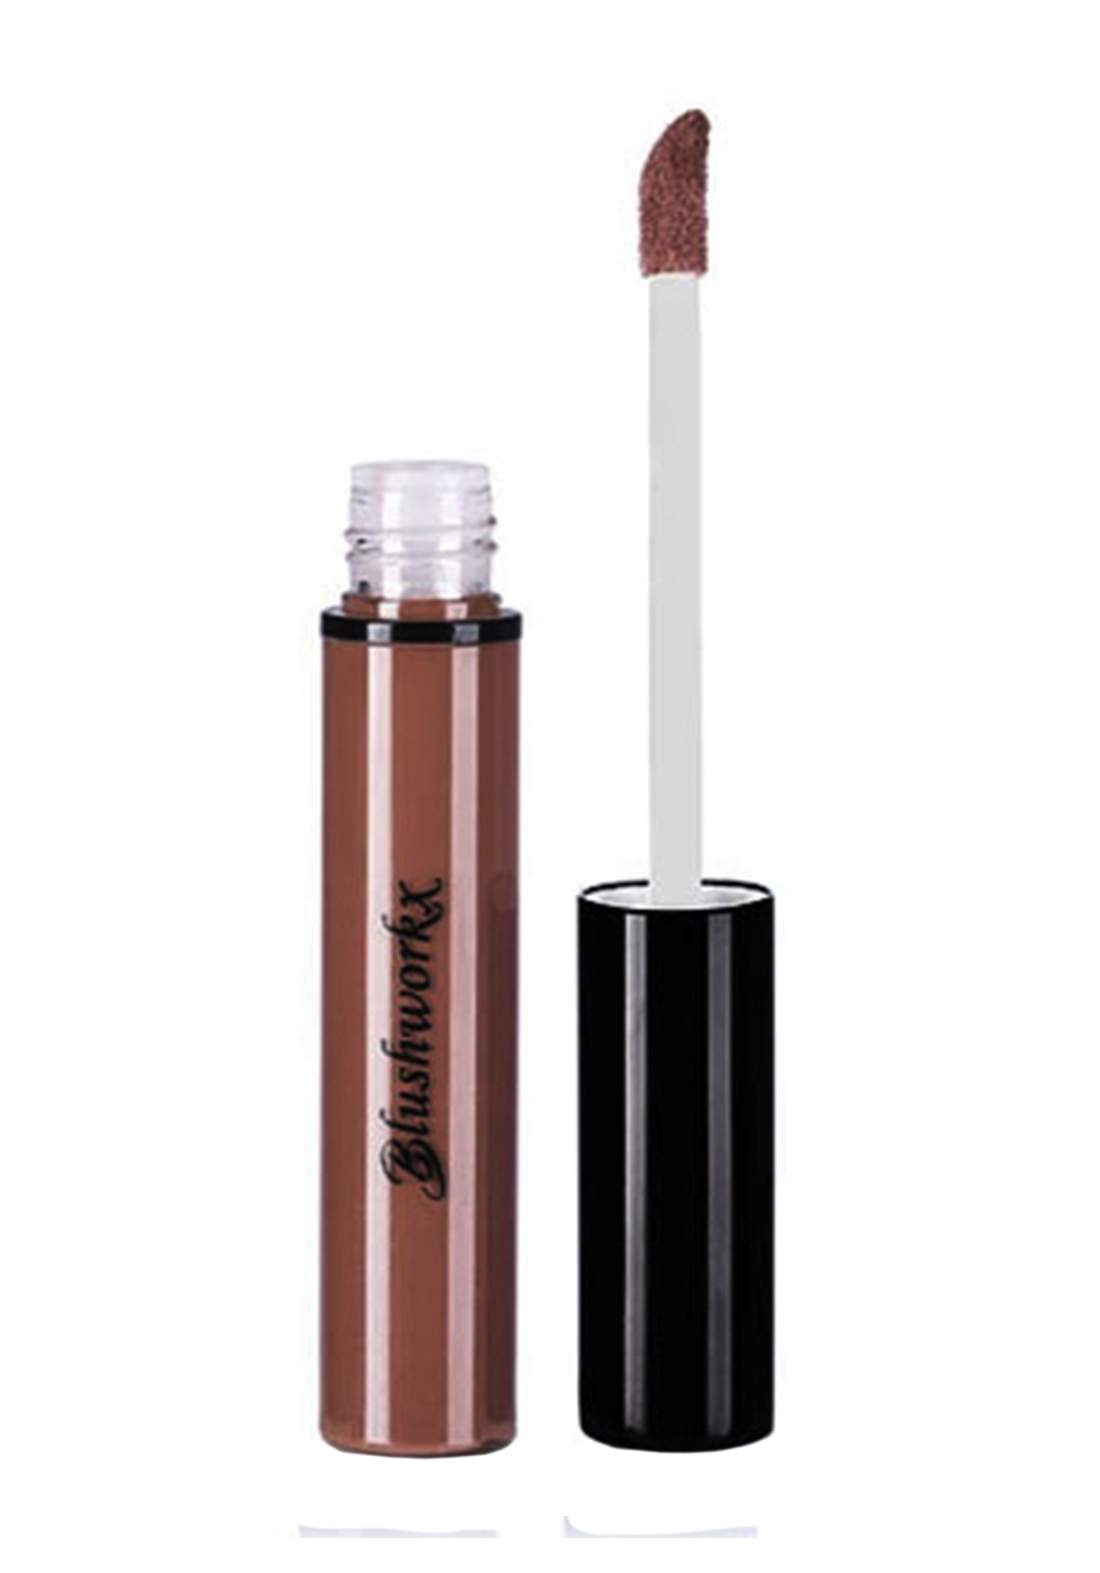 Blushworkx Hollywood Lip Lacquers 5.7g Mocha احمر شفاه